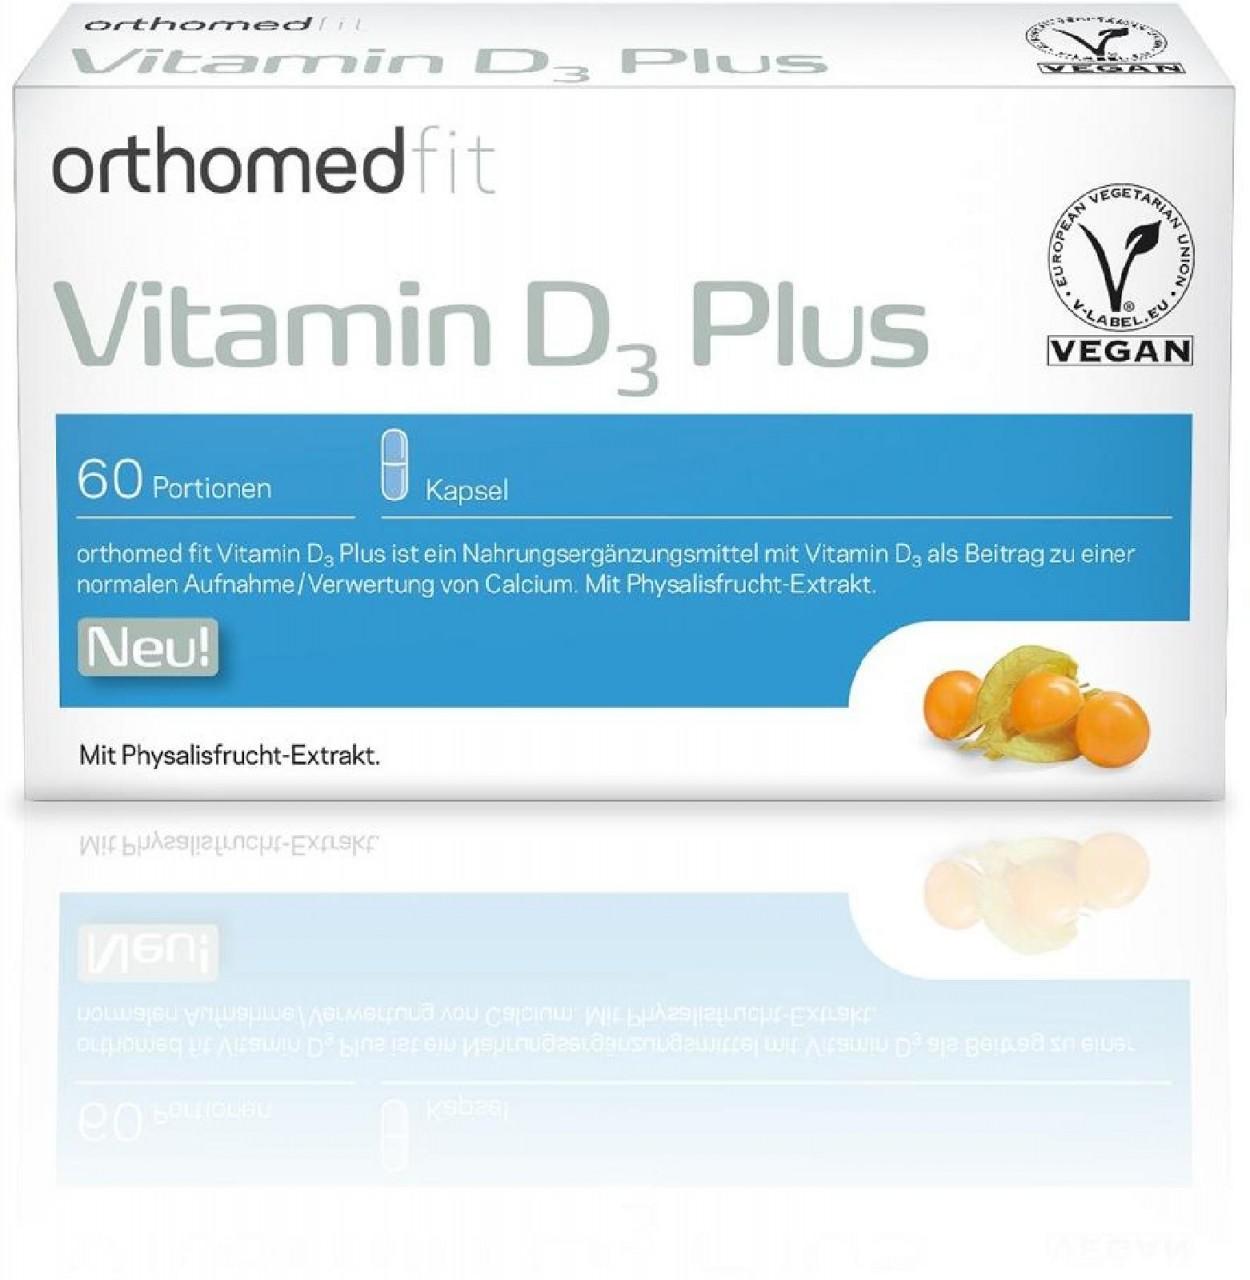 Orthomed fit Vitamin D3 Plus Kapsel, 60 Tagesportionen (V963-30)